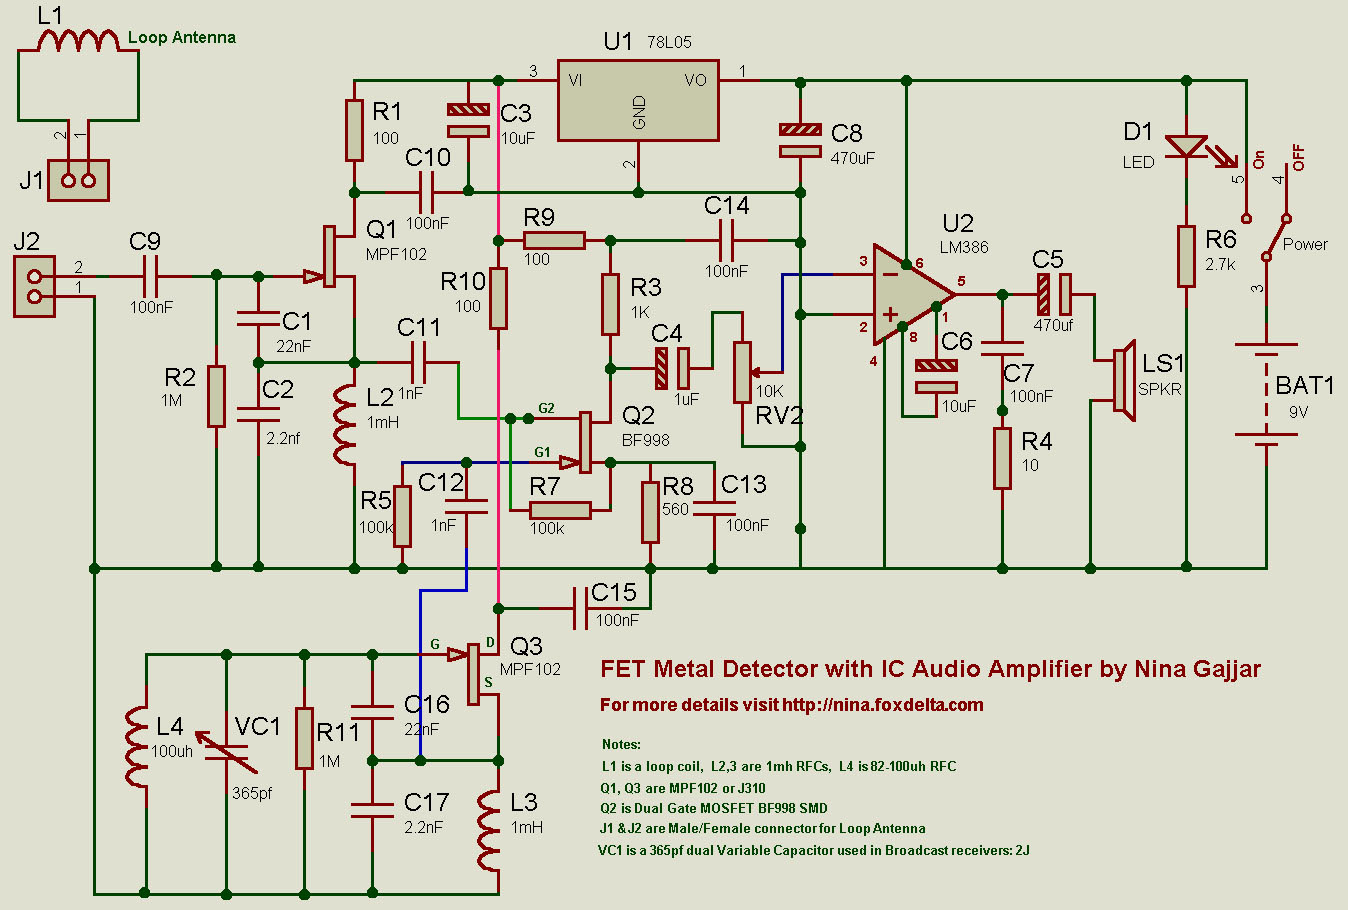 Fet Metal Detector By Nina Gajjar Schematic Circuit Diagram Audio Amplifier Circuits